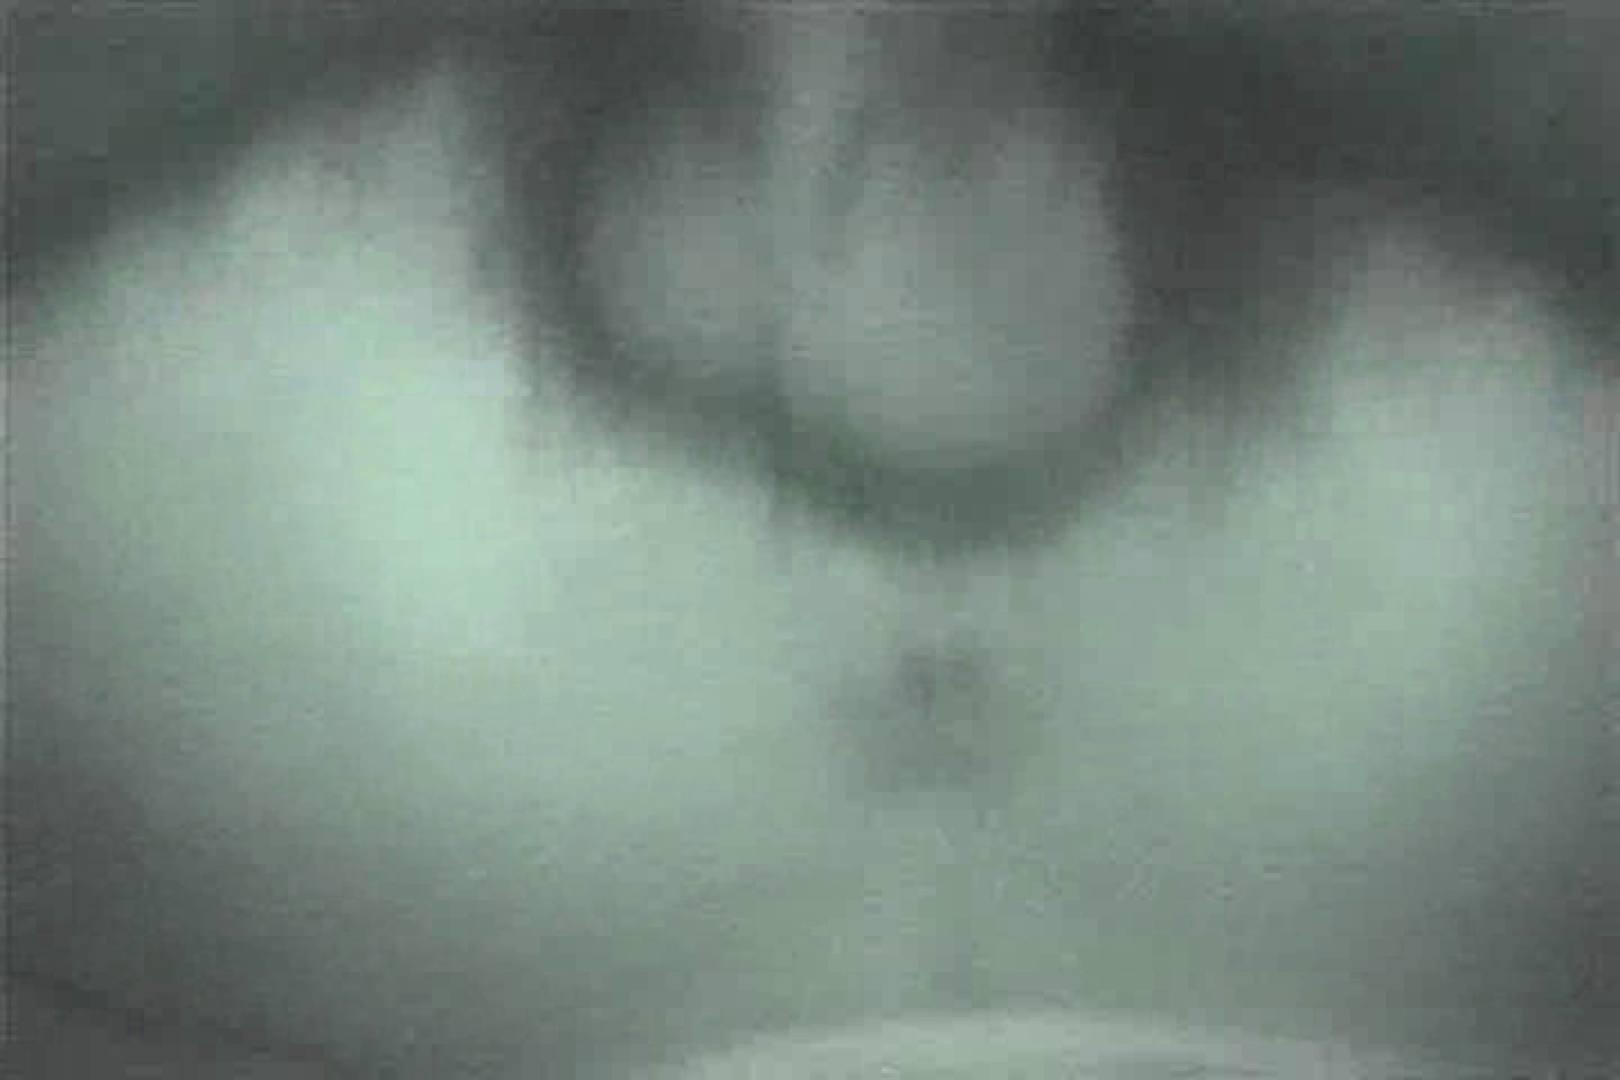 MASAさんの待ち伏せ撮り! 赤外線カーセックスVol.19 赤外線 オメコ無修正動画無料 101pic 19